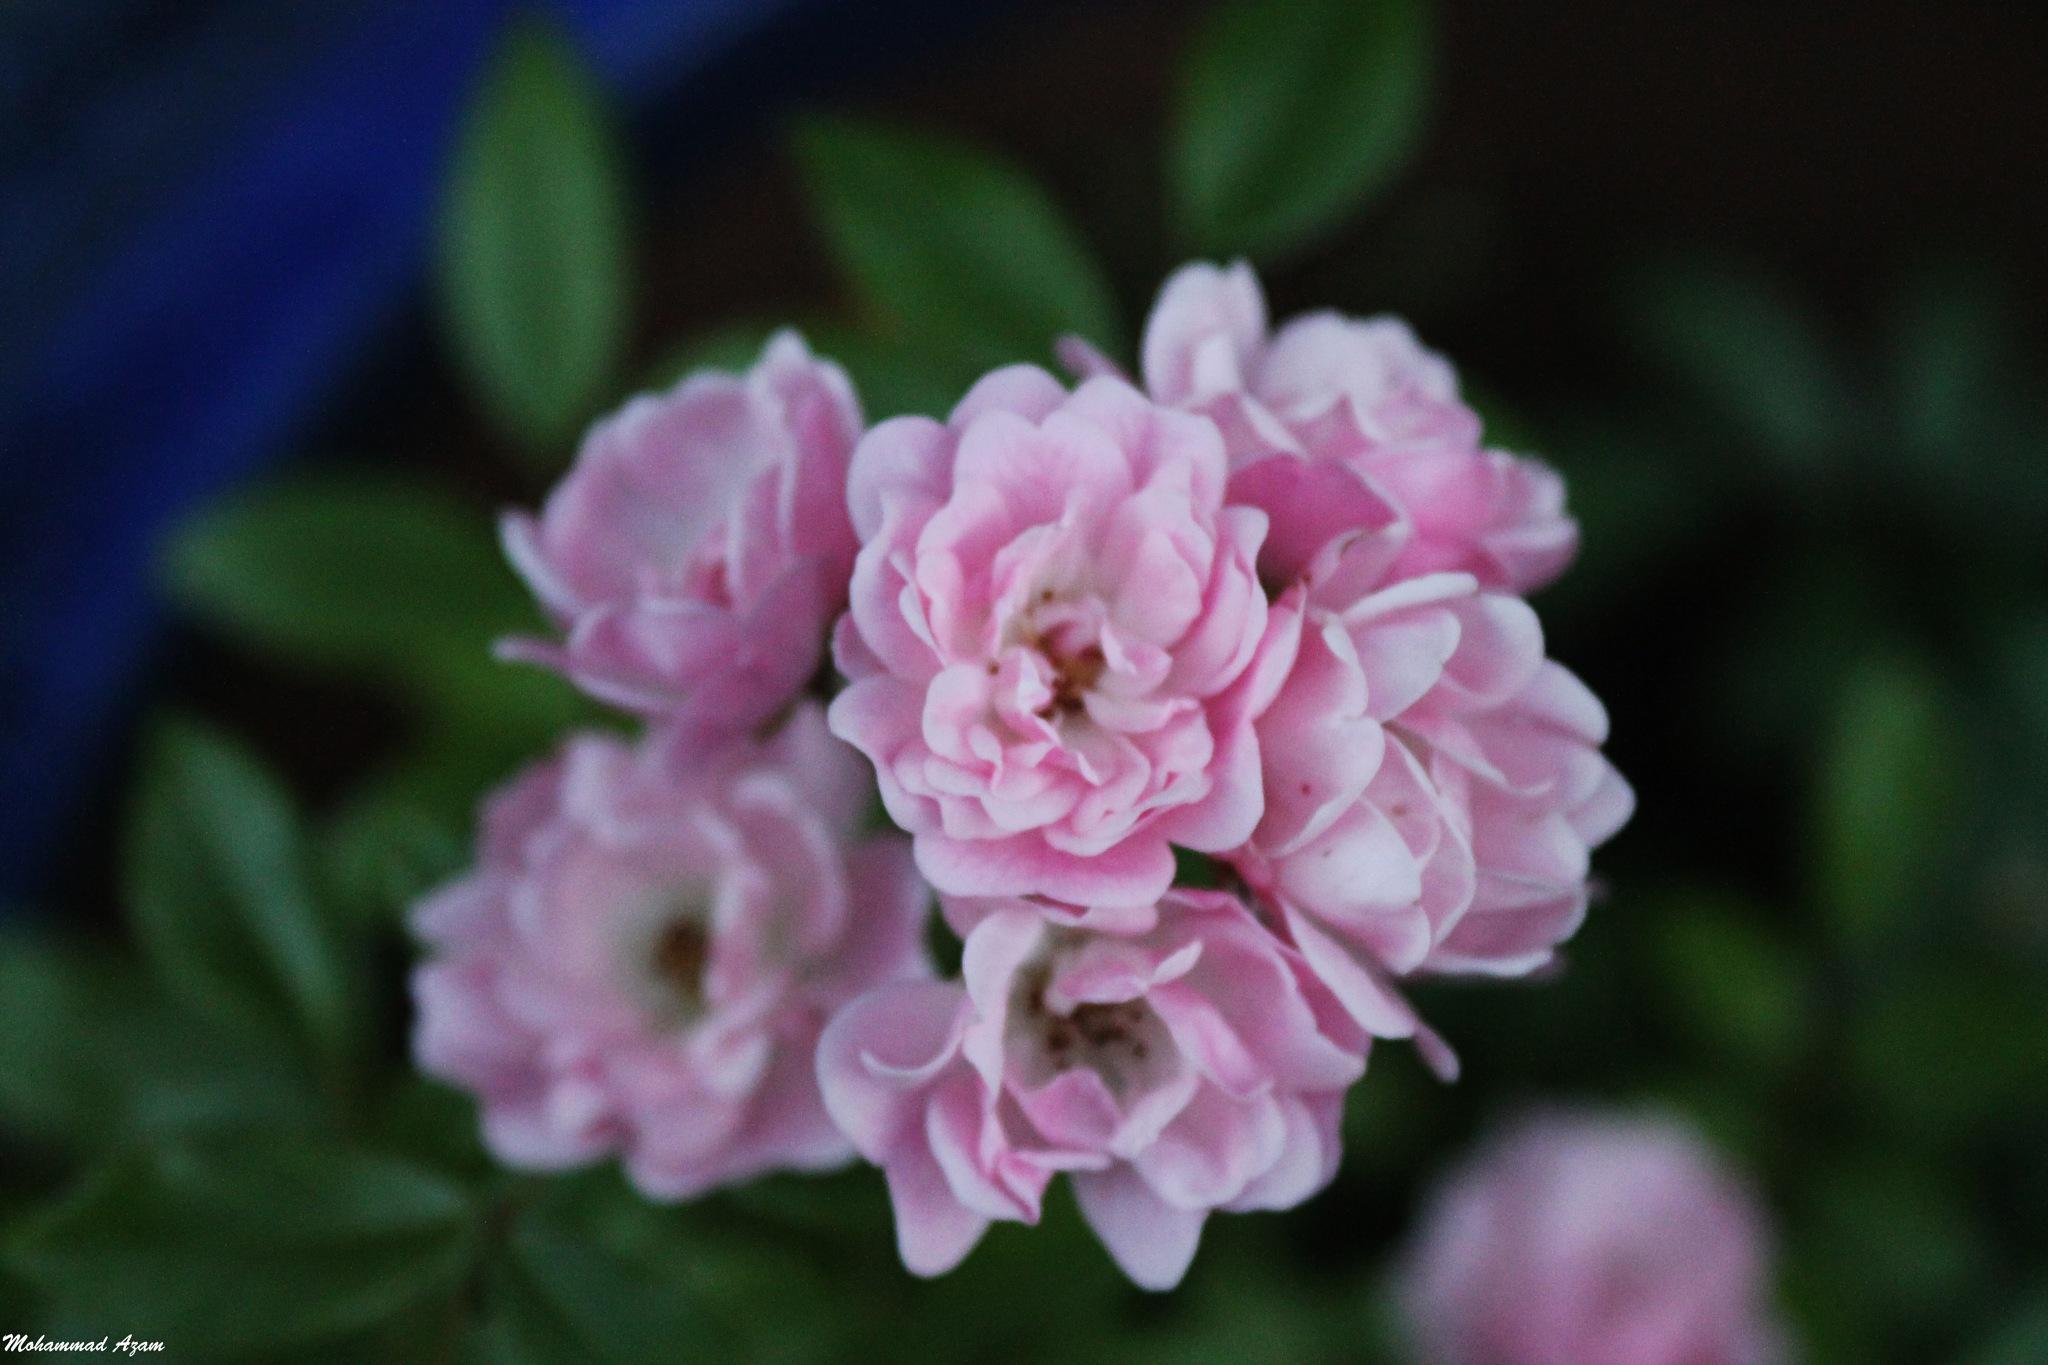 Flower 122 by Mohammad Azam